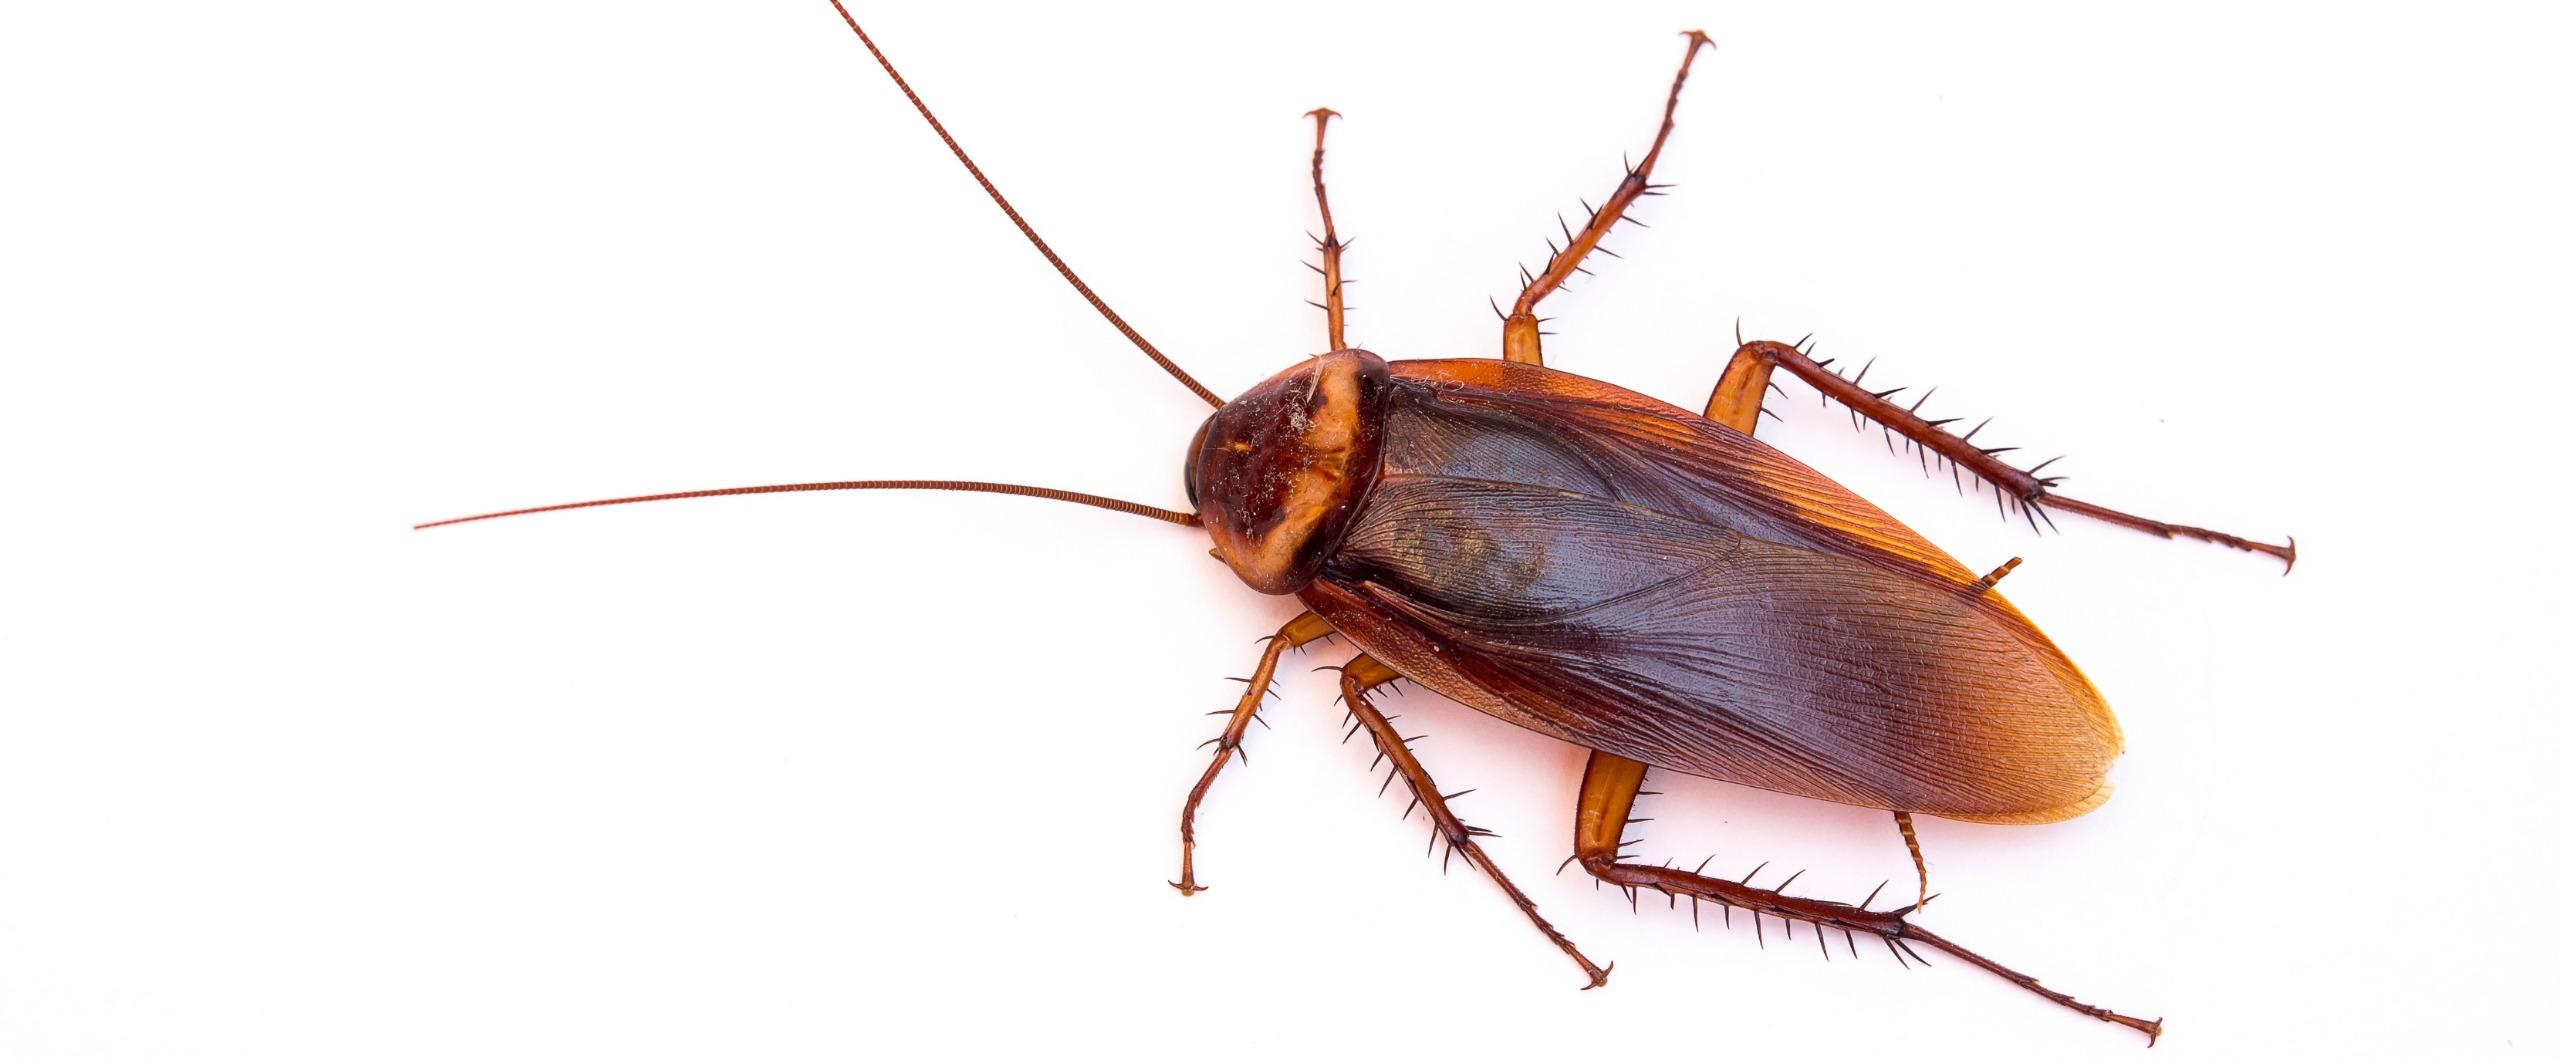 Cockroach photo